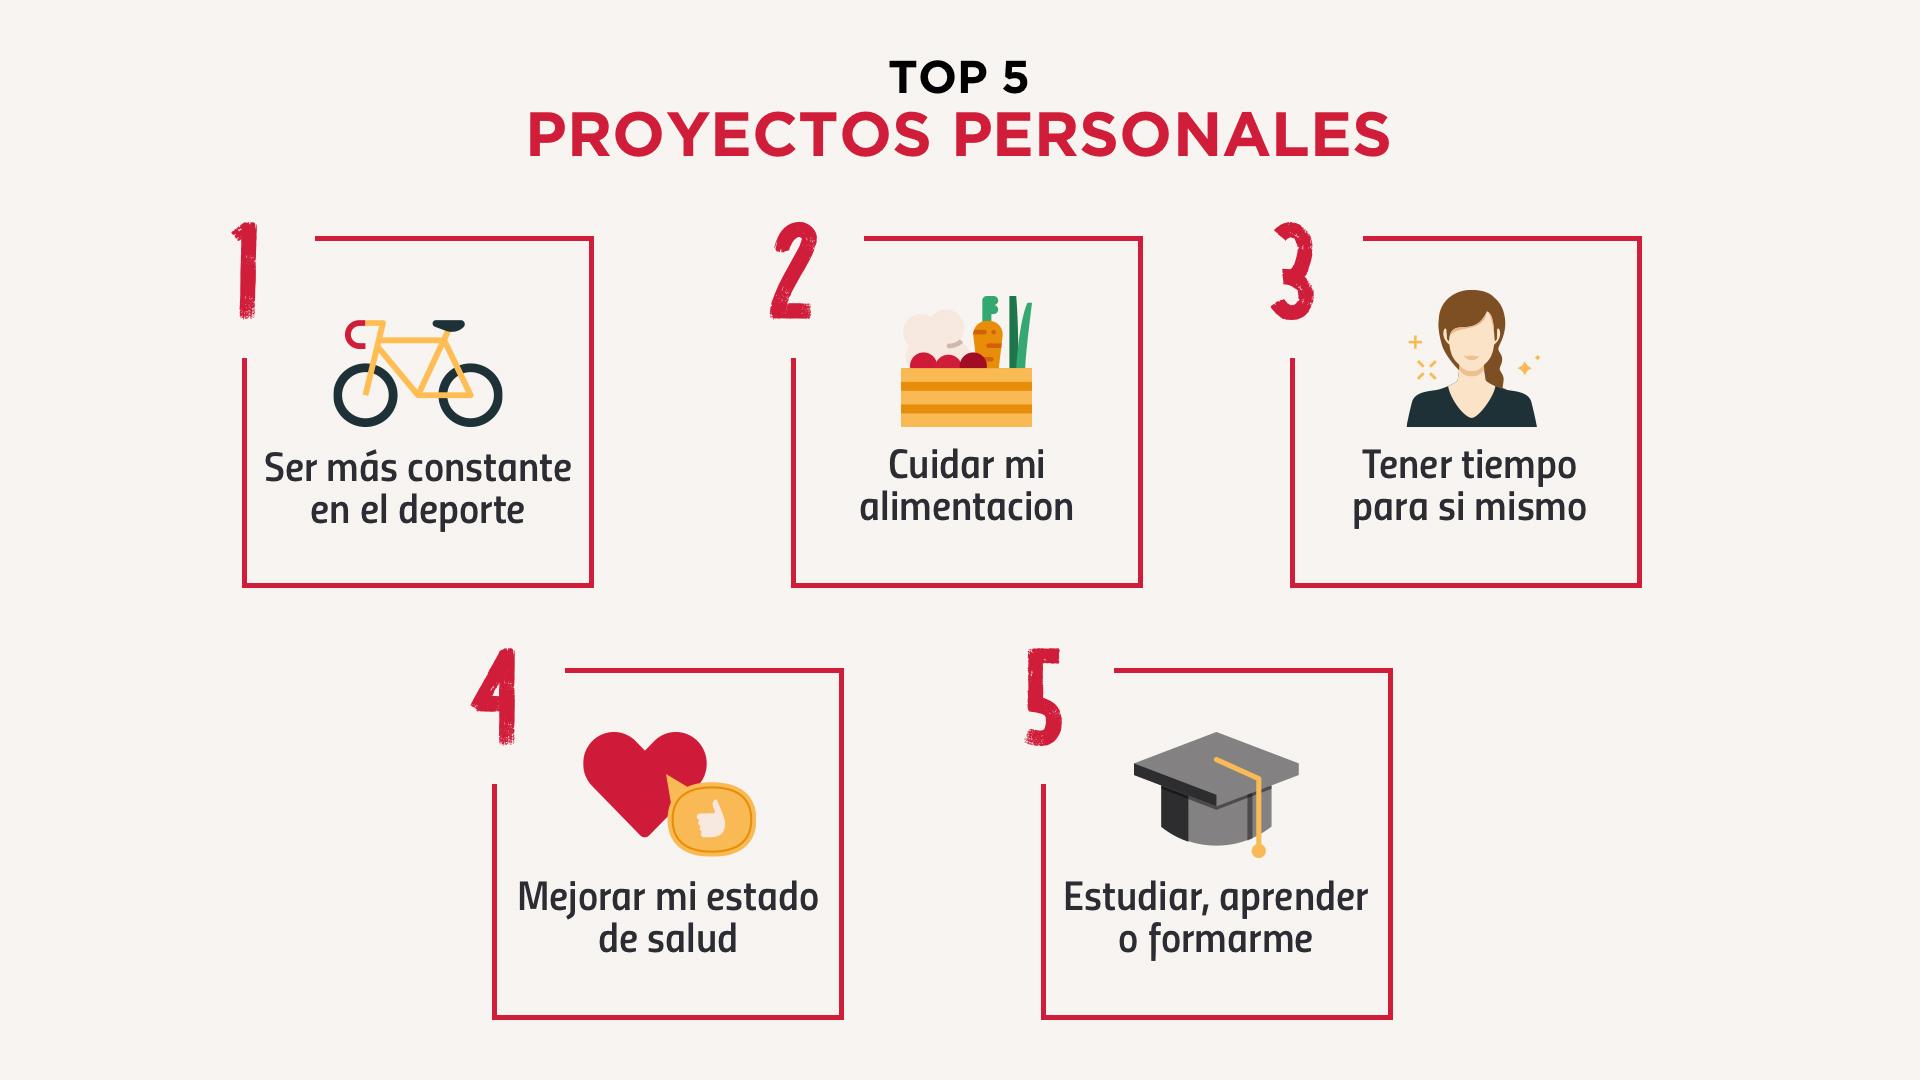 TOP 5 PROYECTOS PERSONALES